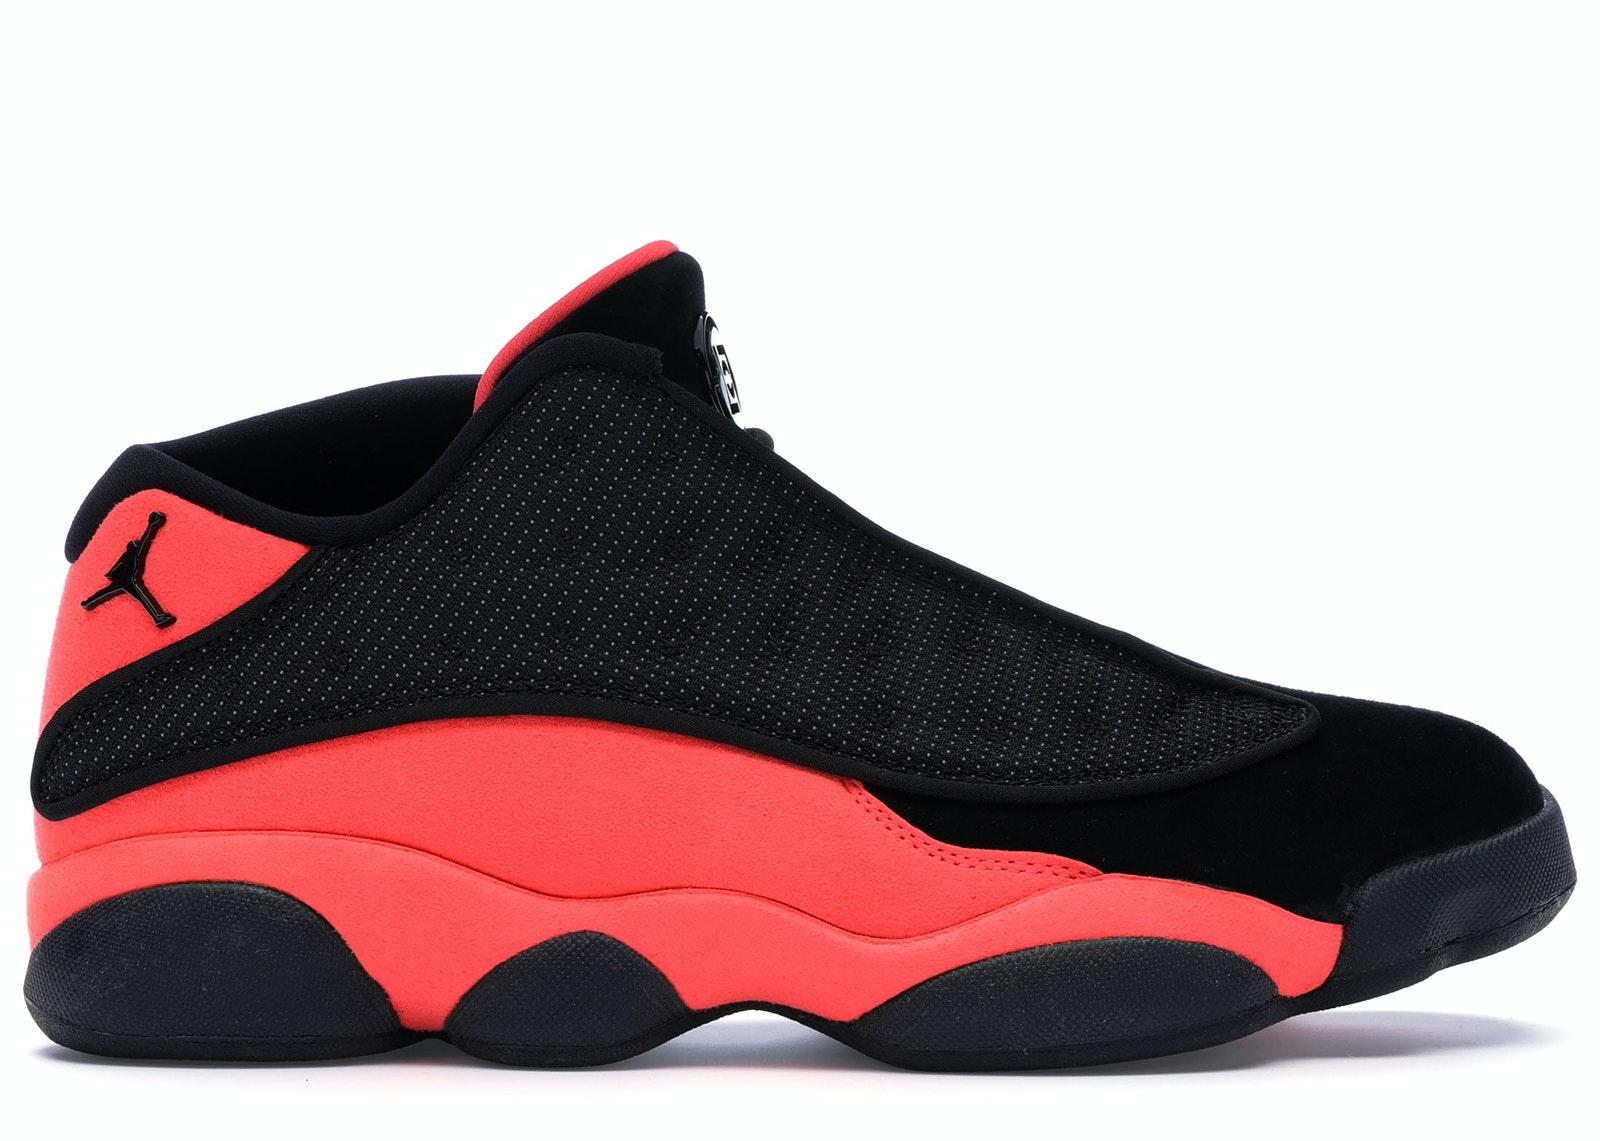 Jordan 13 Retro Low Clot Black Red